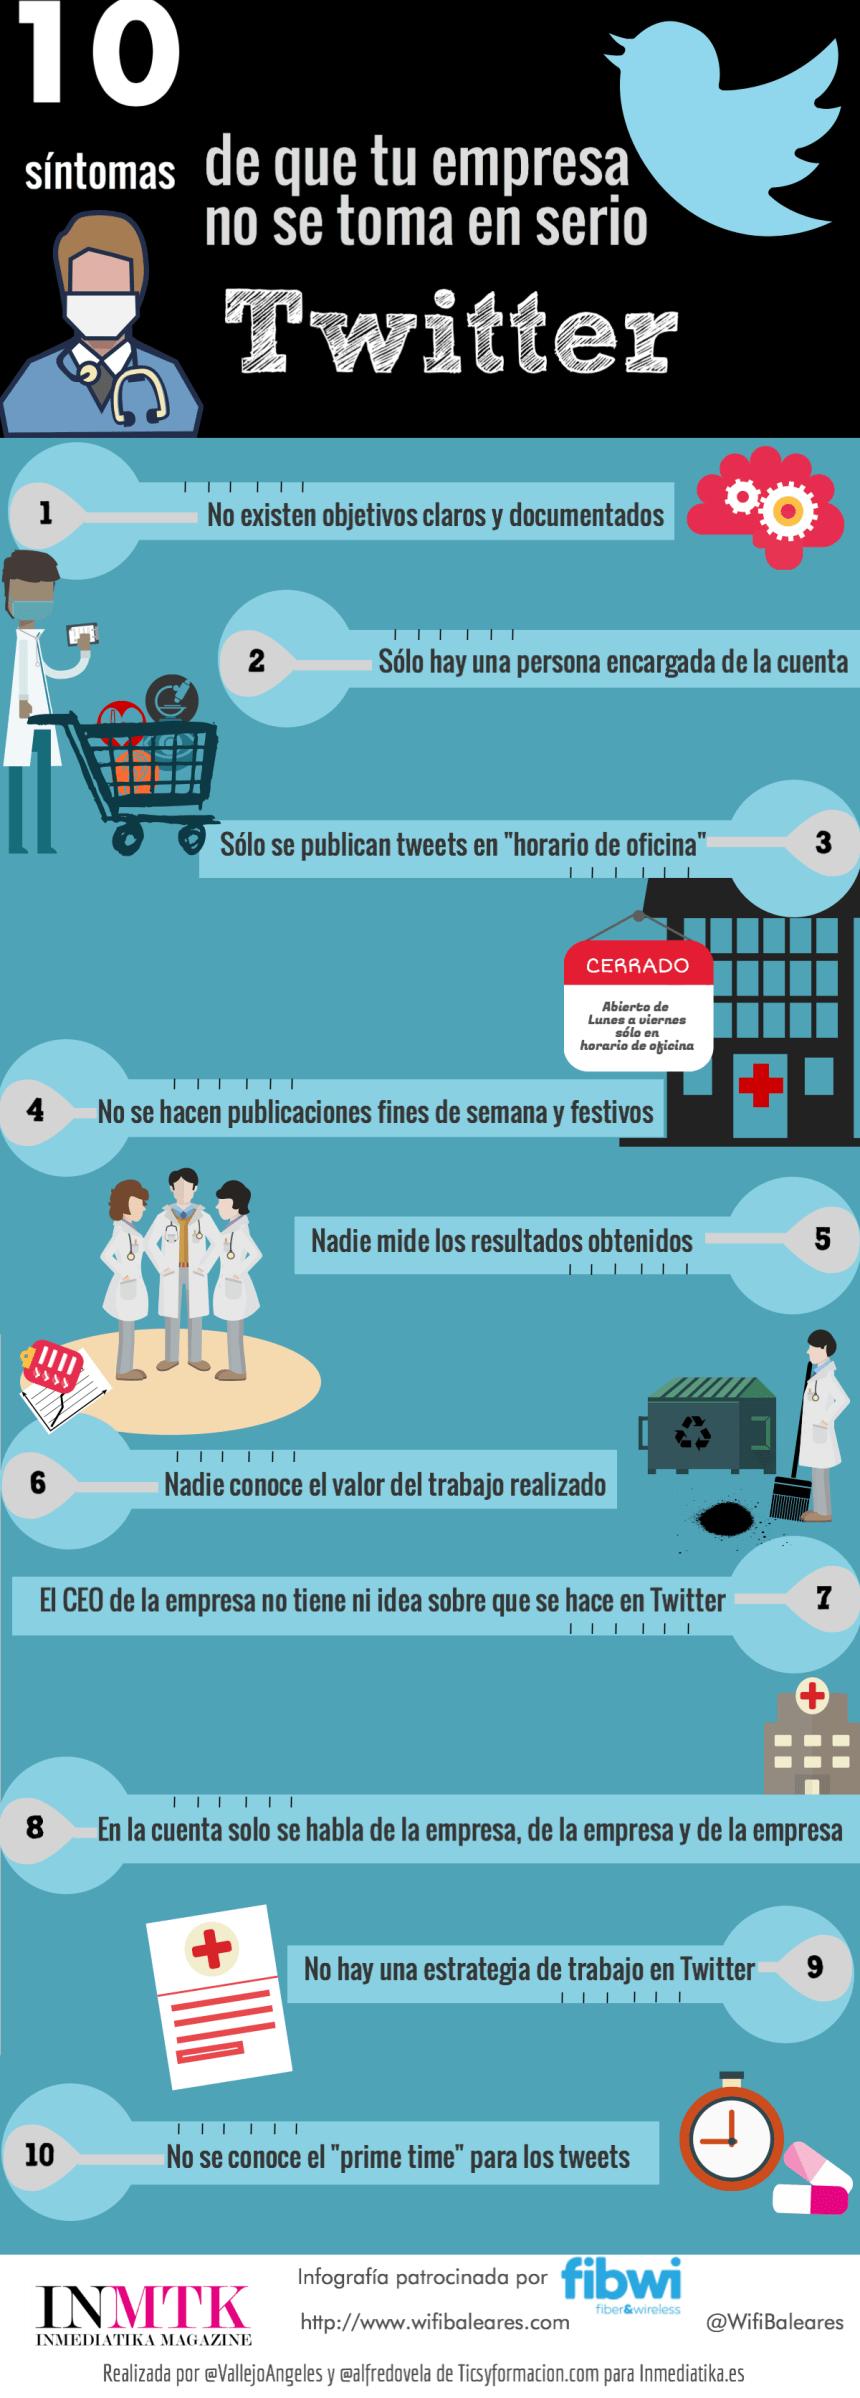 10 síntomas de que tu empresa no se toma en serio Twitter